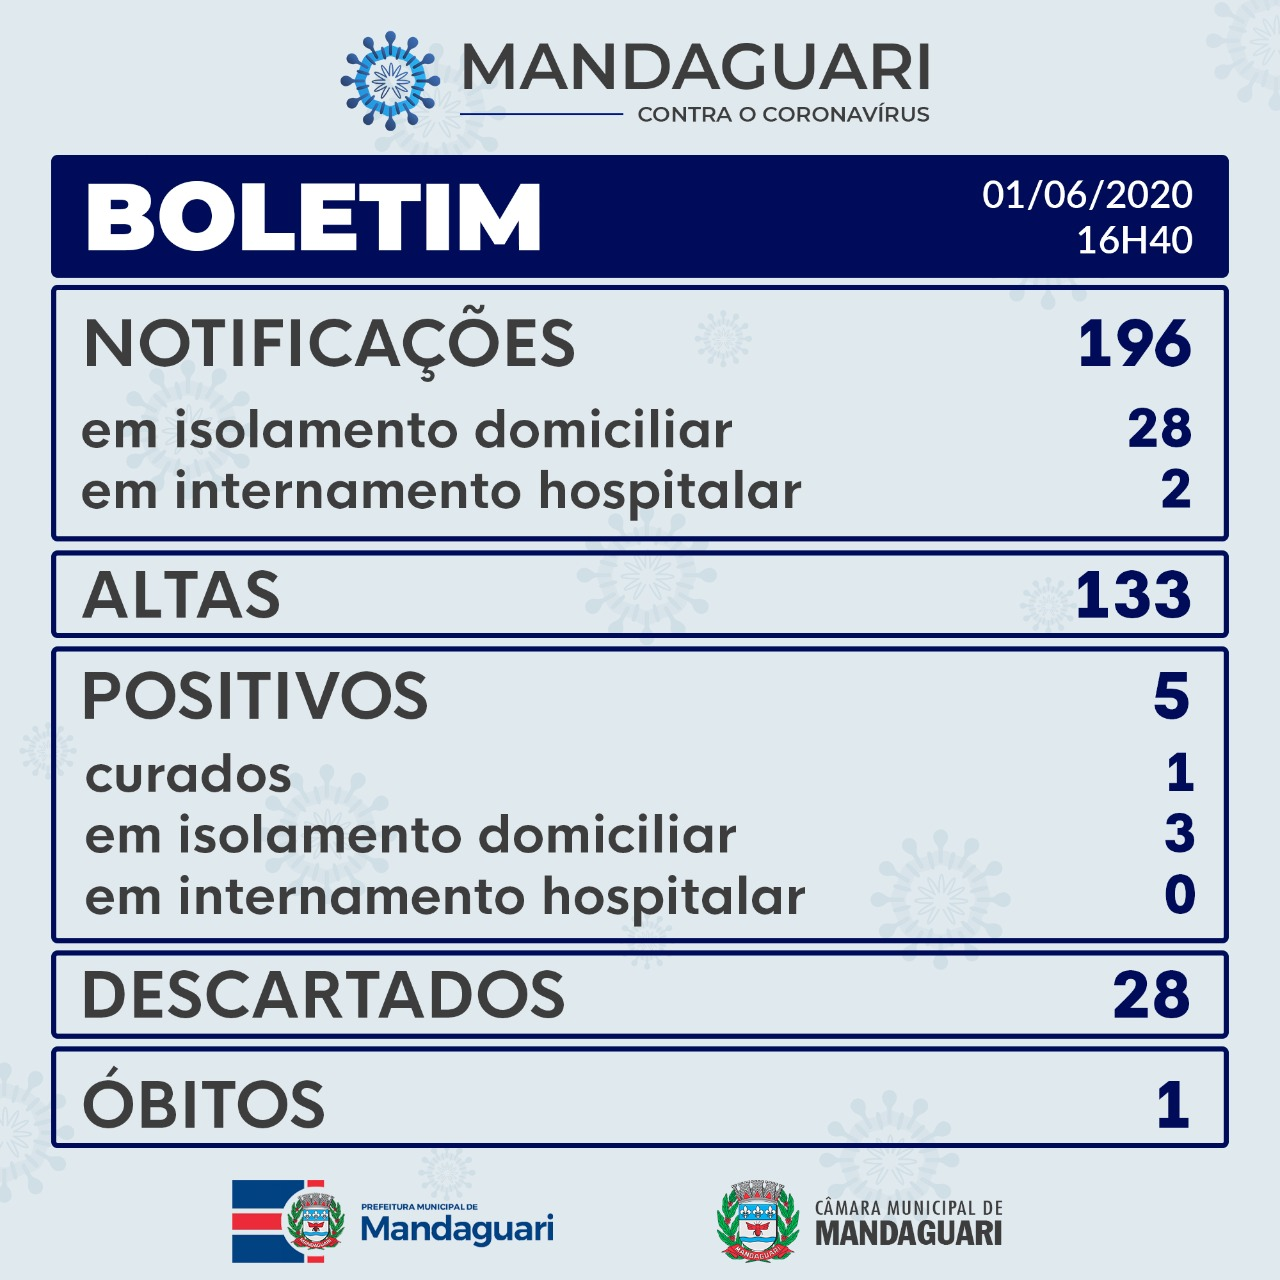 Boletim Covid-19 de 01/06/2020